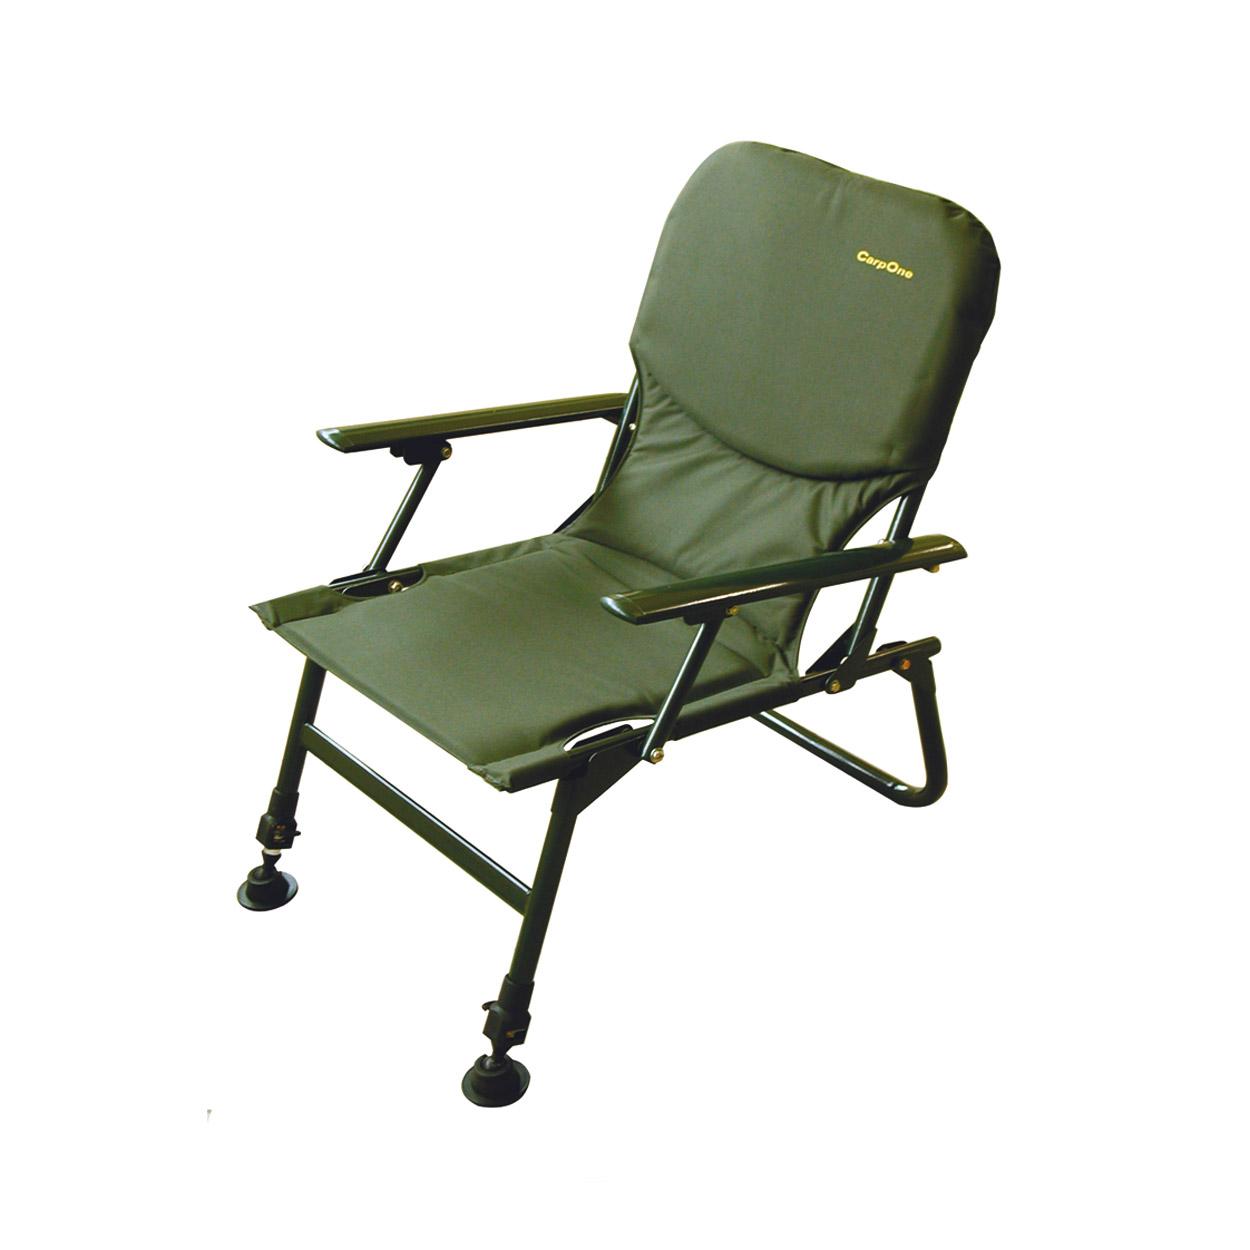 Sedia Basic 2 Piedi con Braccioli Seduta